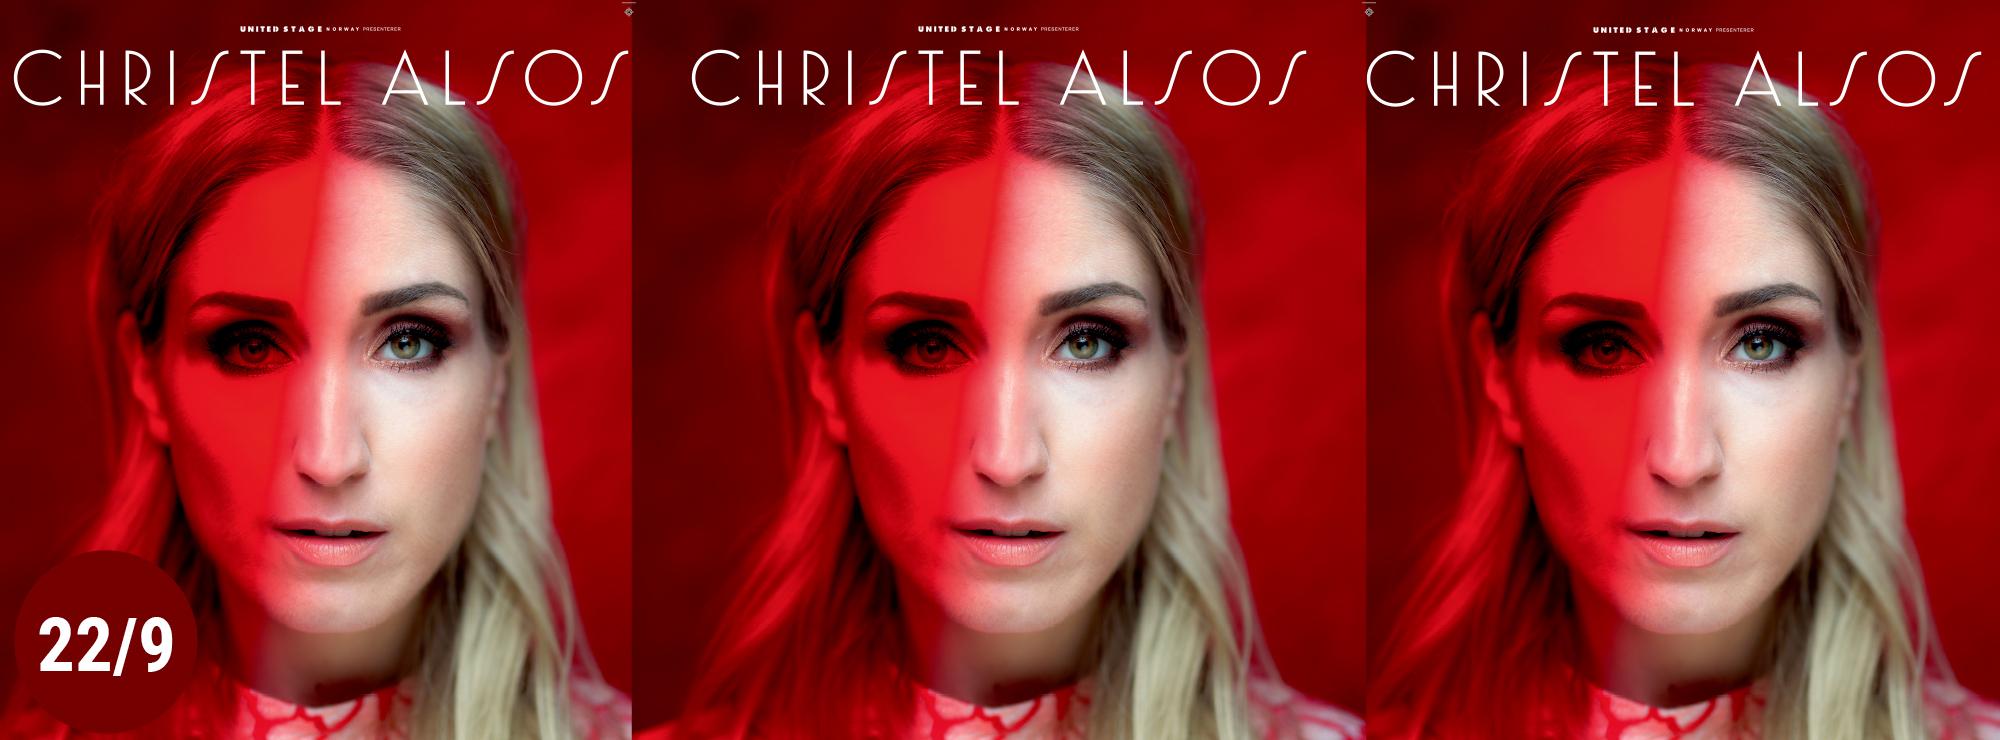 Christel Alsos